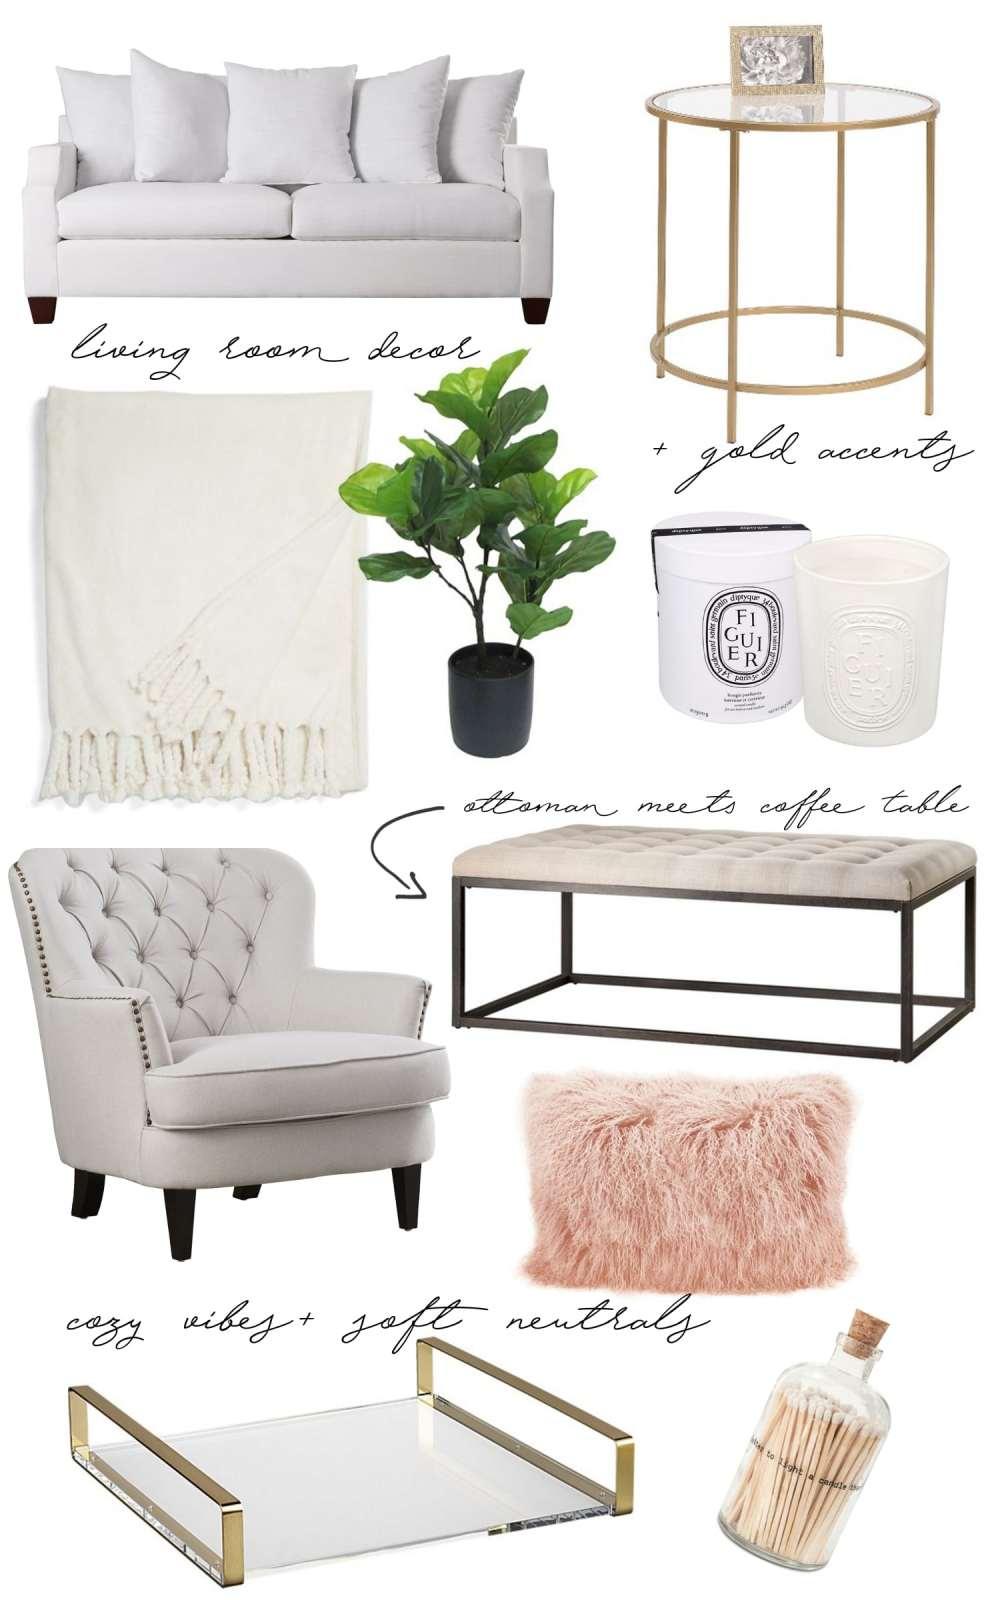 living-room-decor-wish-list